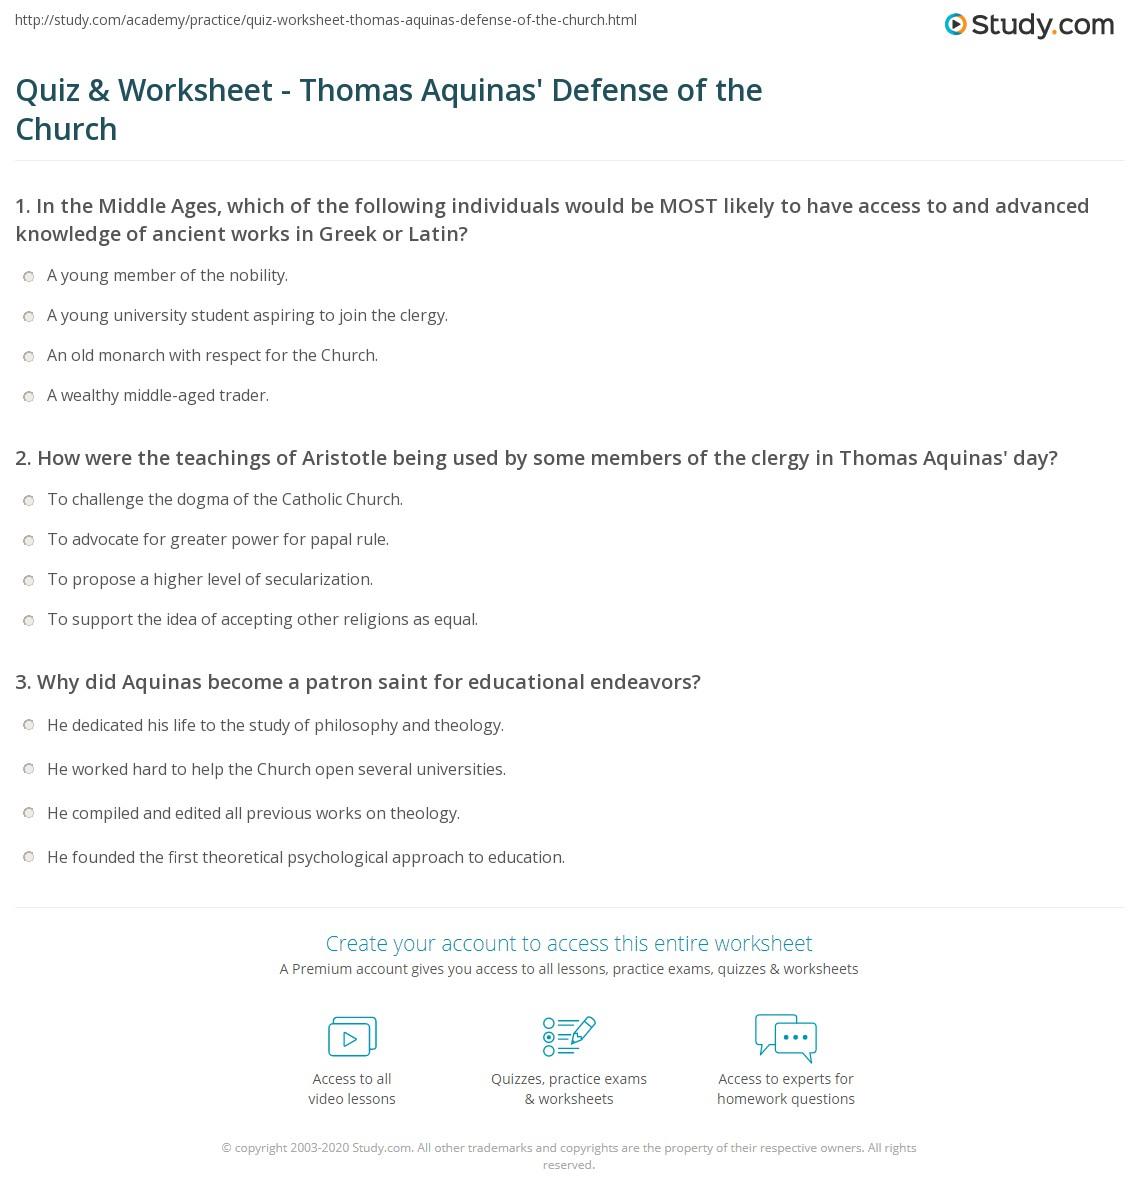 Worksheets Binomial Distribution Worksheet quiz worksheet thomas aquinas defense of the church study com print influence on catholic worksheet